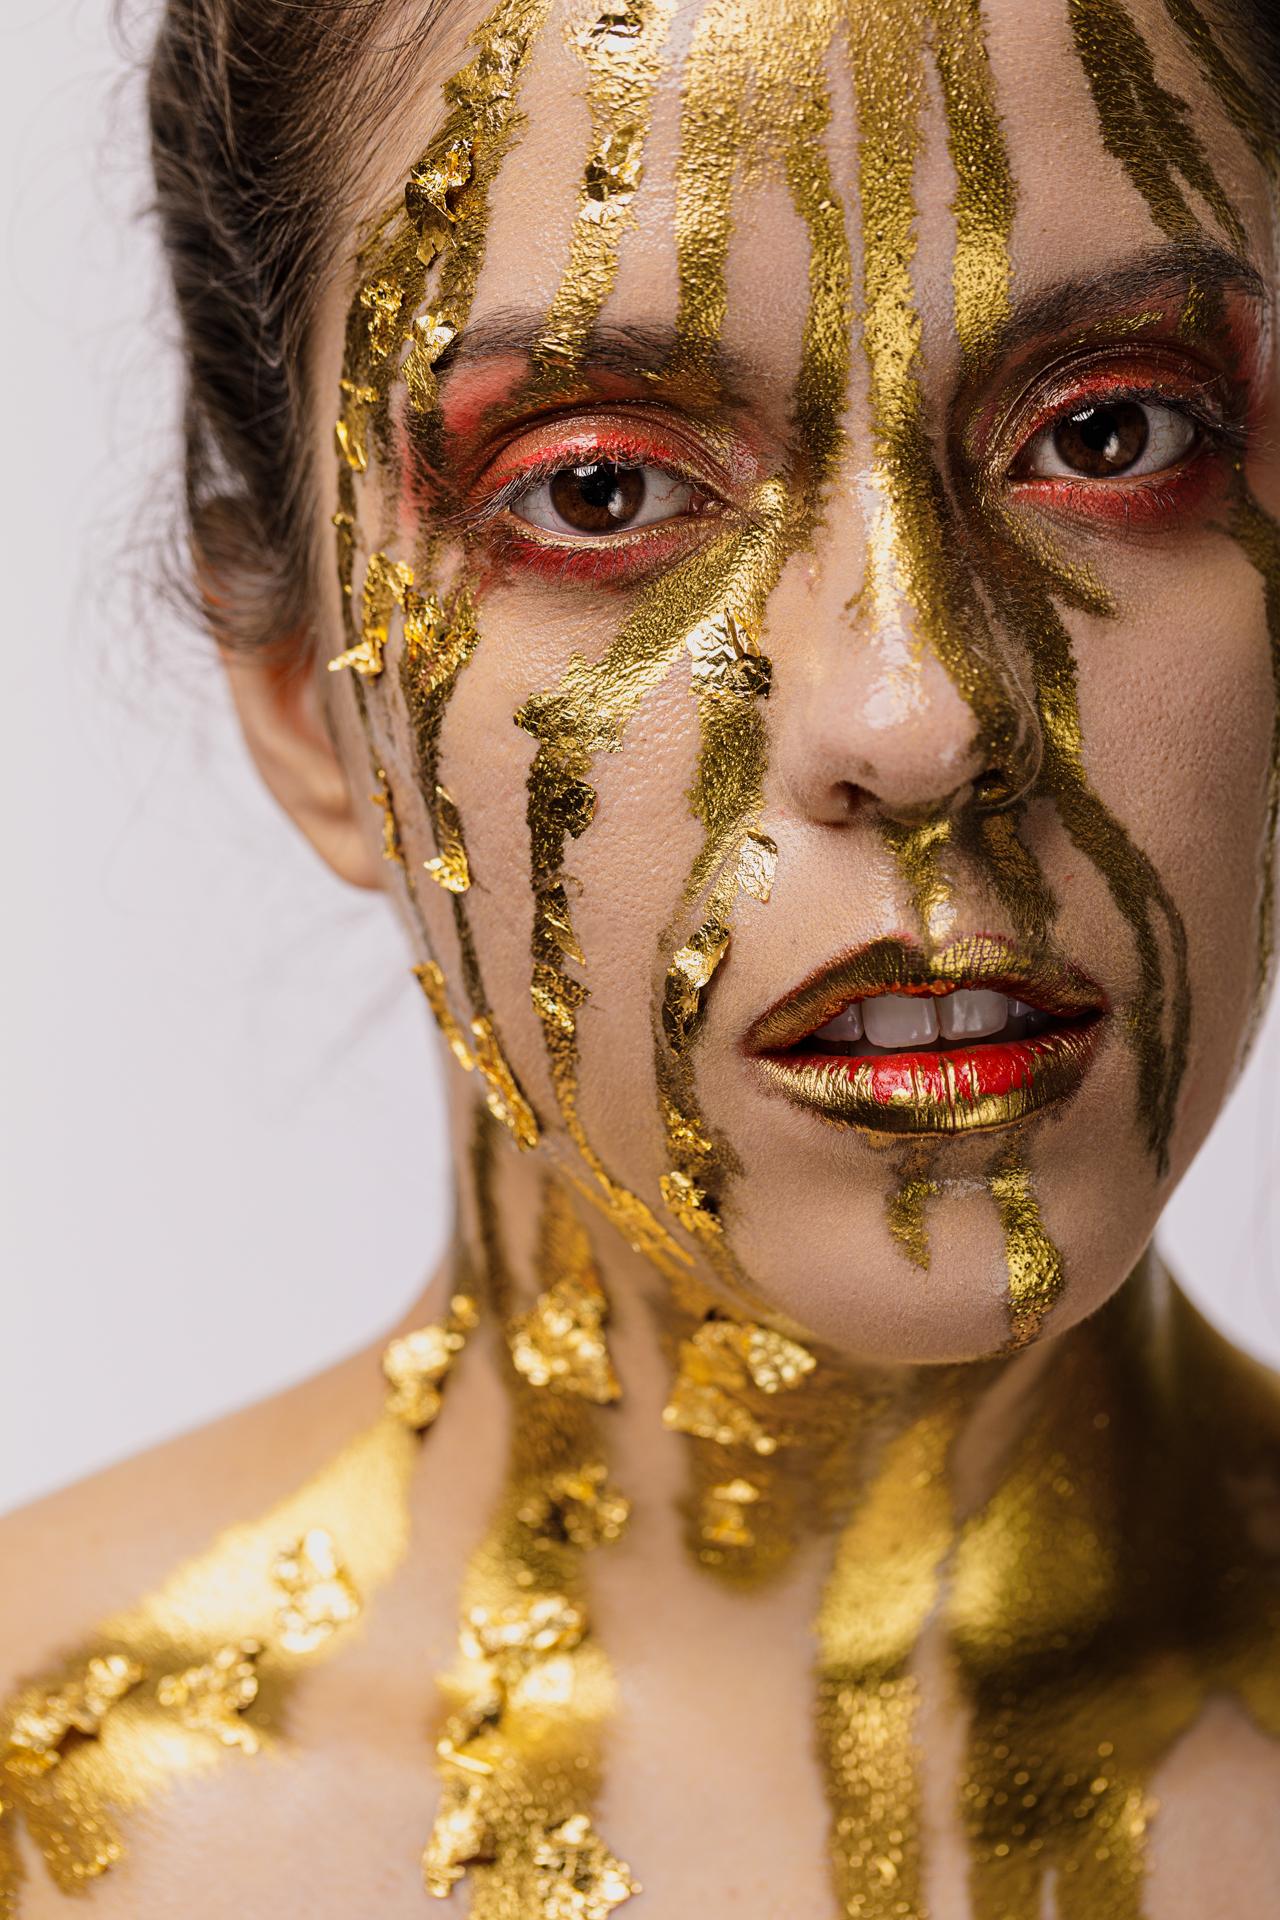 CFrenette-Julie-maquillage-8